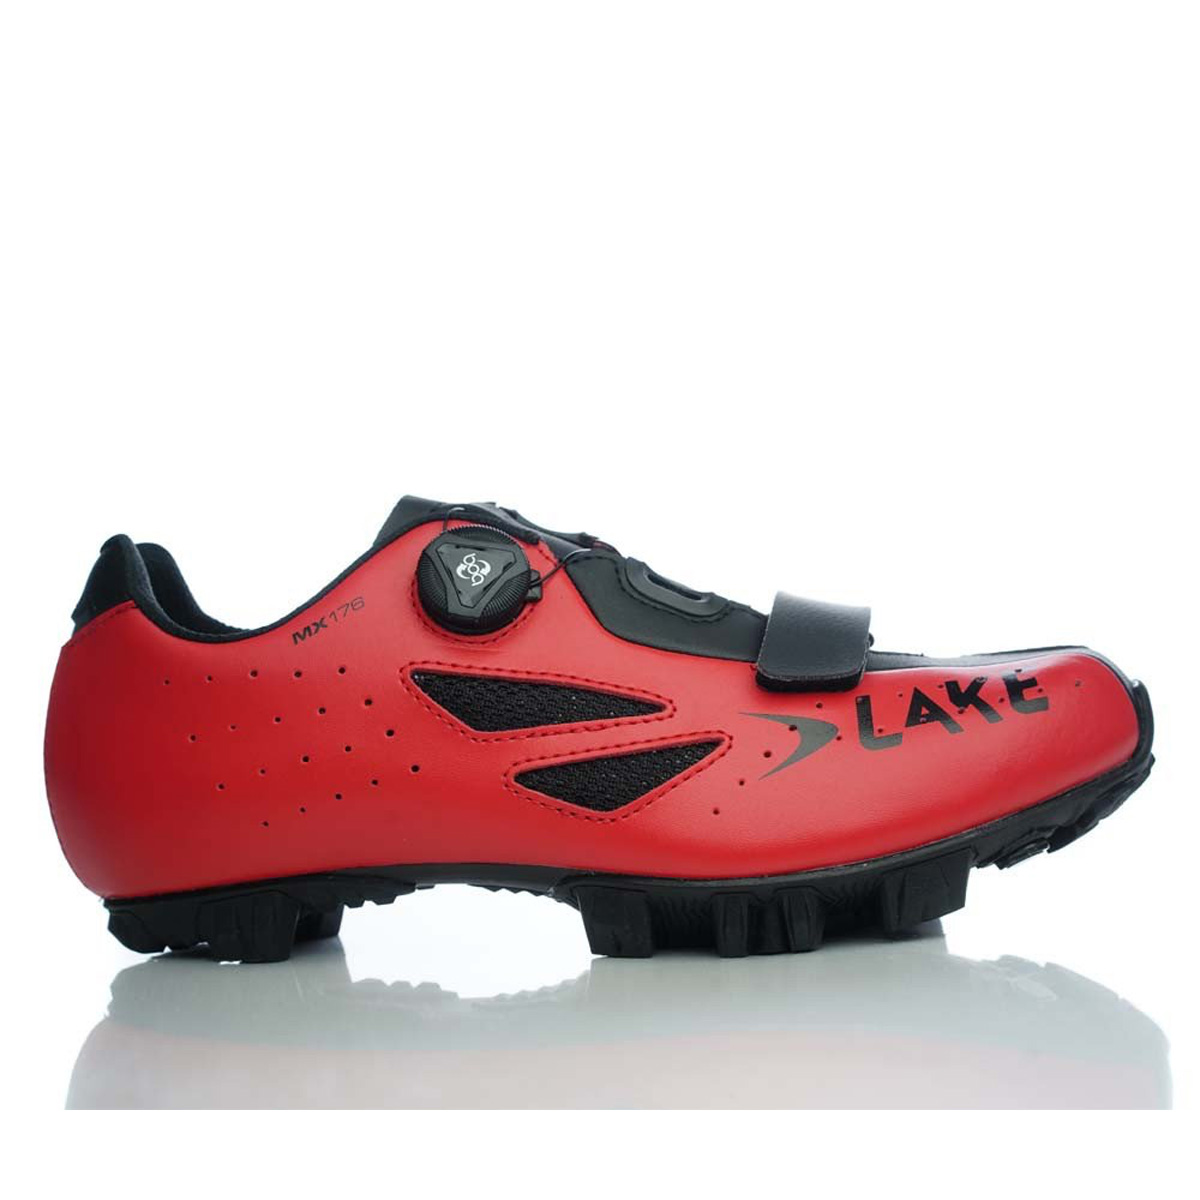 Lake Cycling 2017 Men's MX176 Mountain Bike Shoes - Red/B...